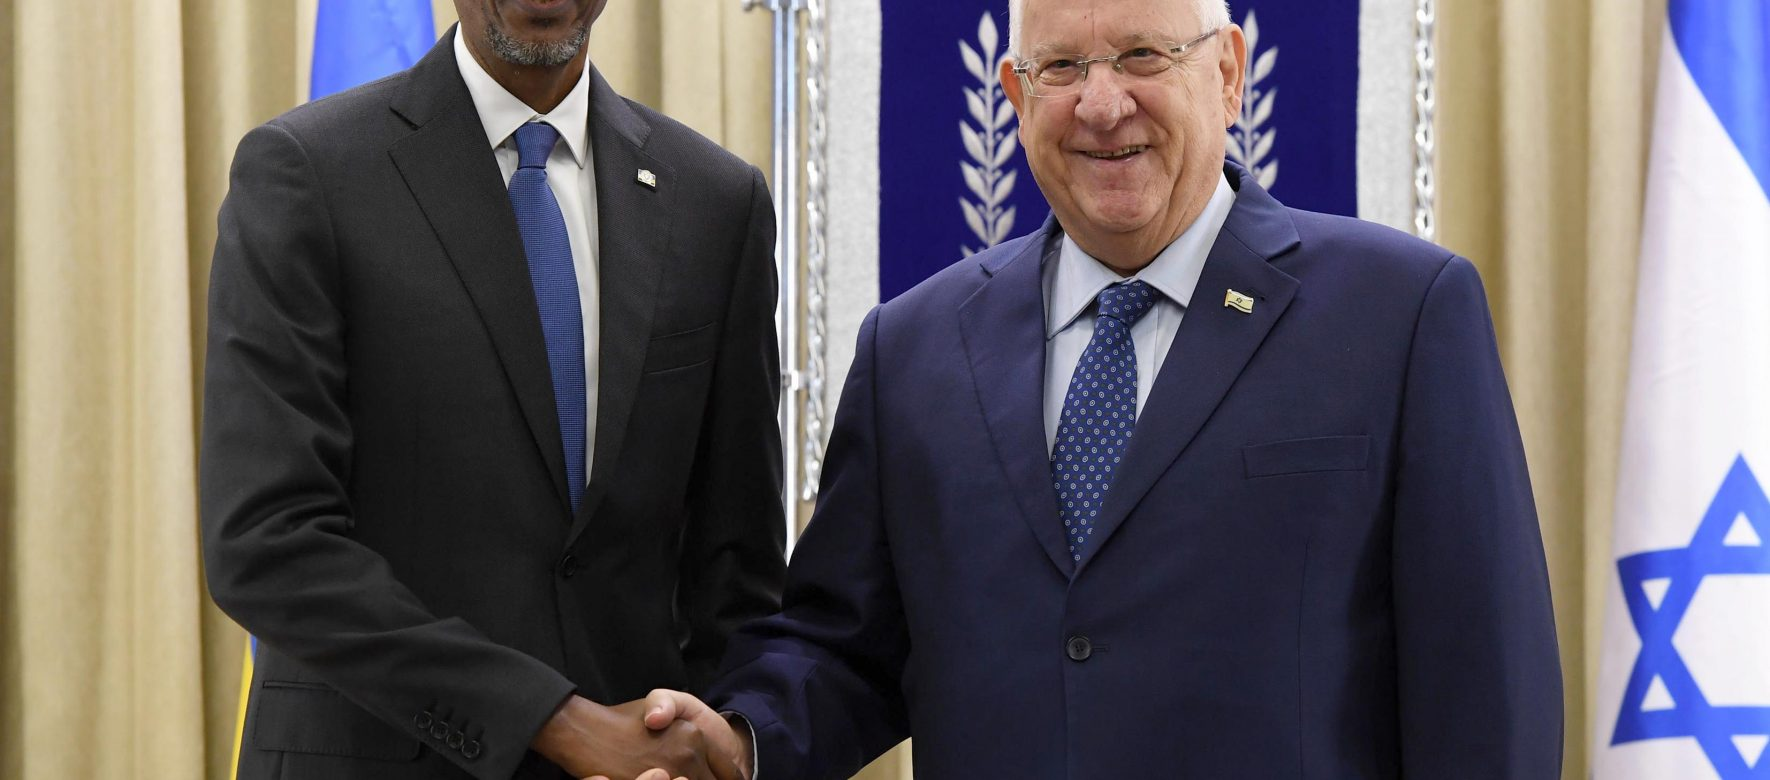 Why is Israel getting closer to Kenya and Rwanda? 2